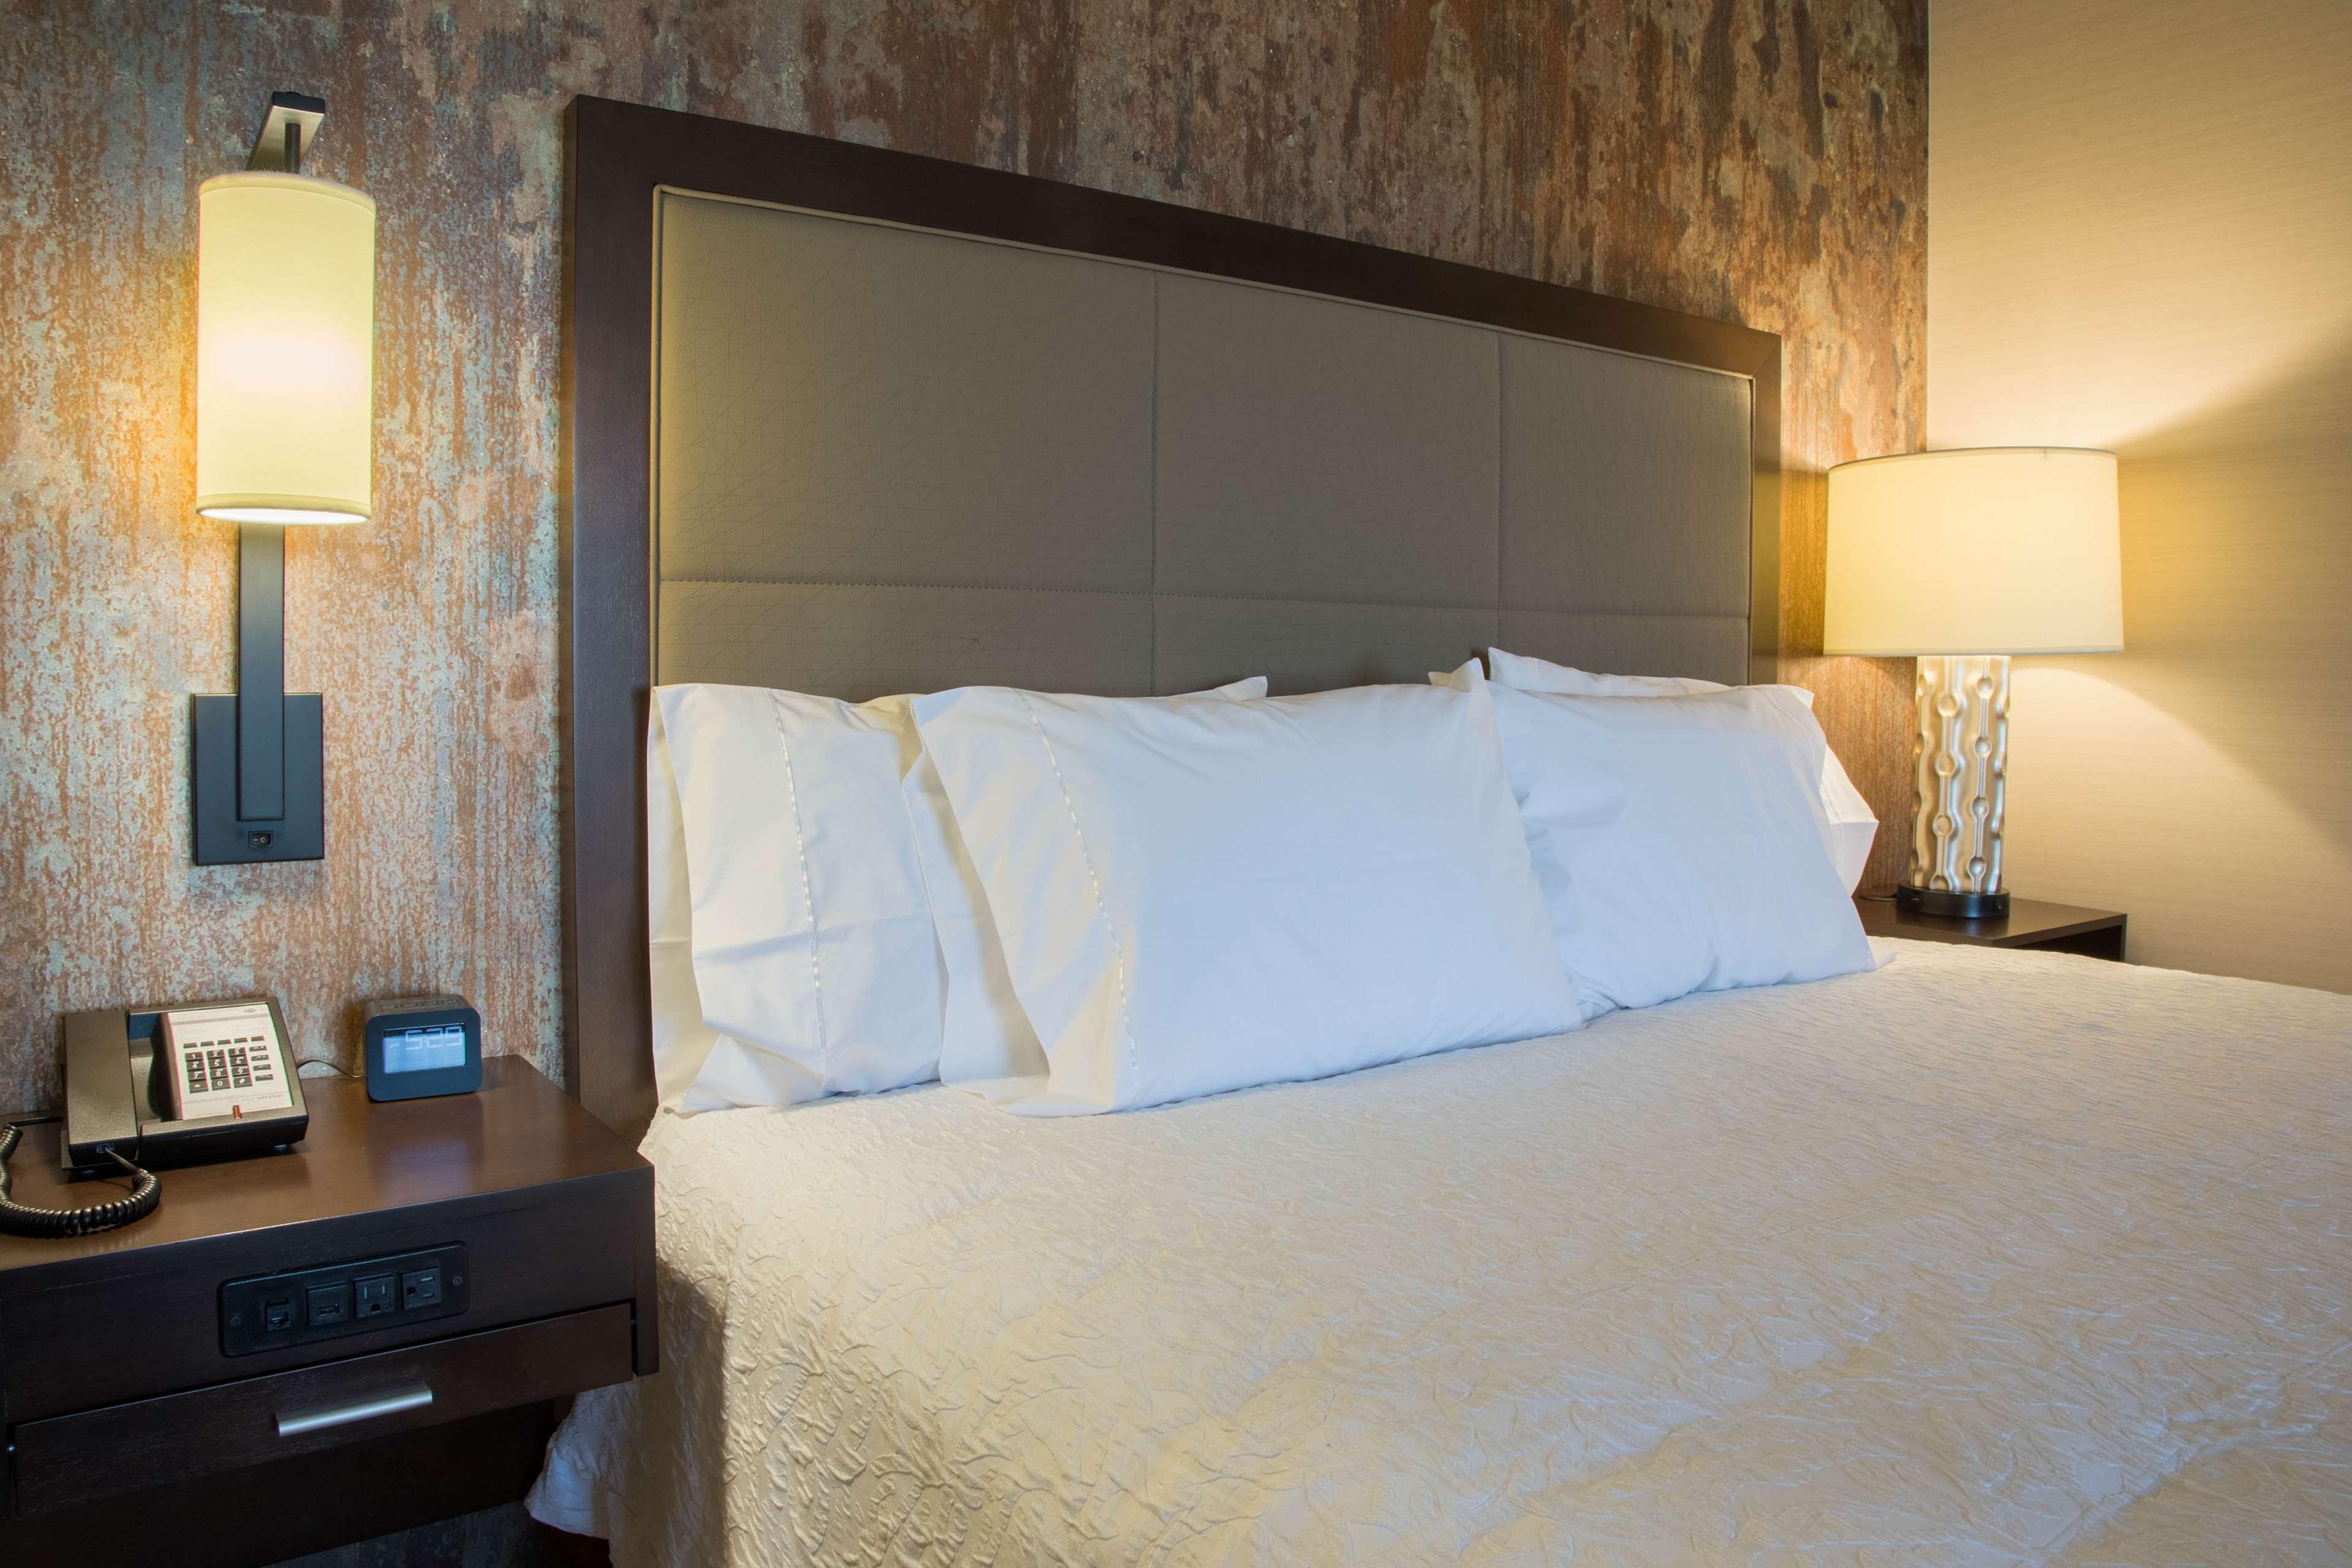 Hampton Inn & Suites Murrieta Temecula image 27